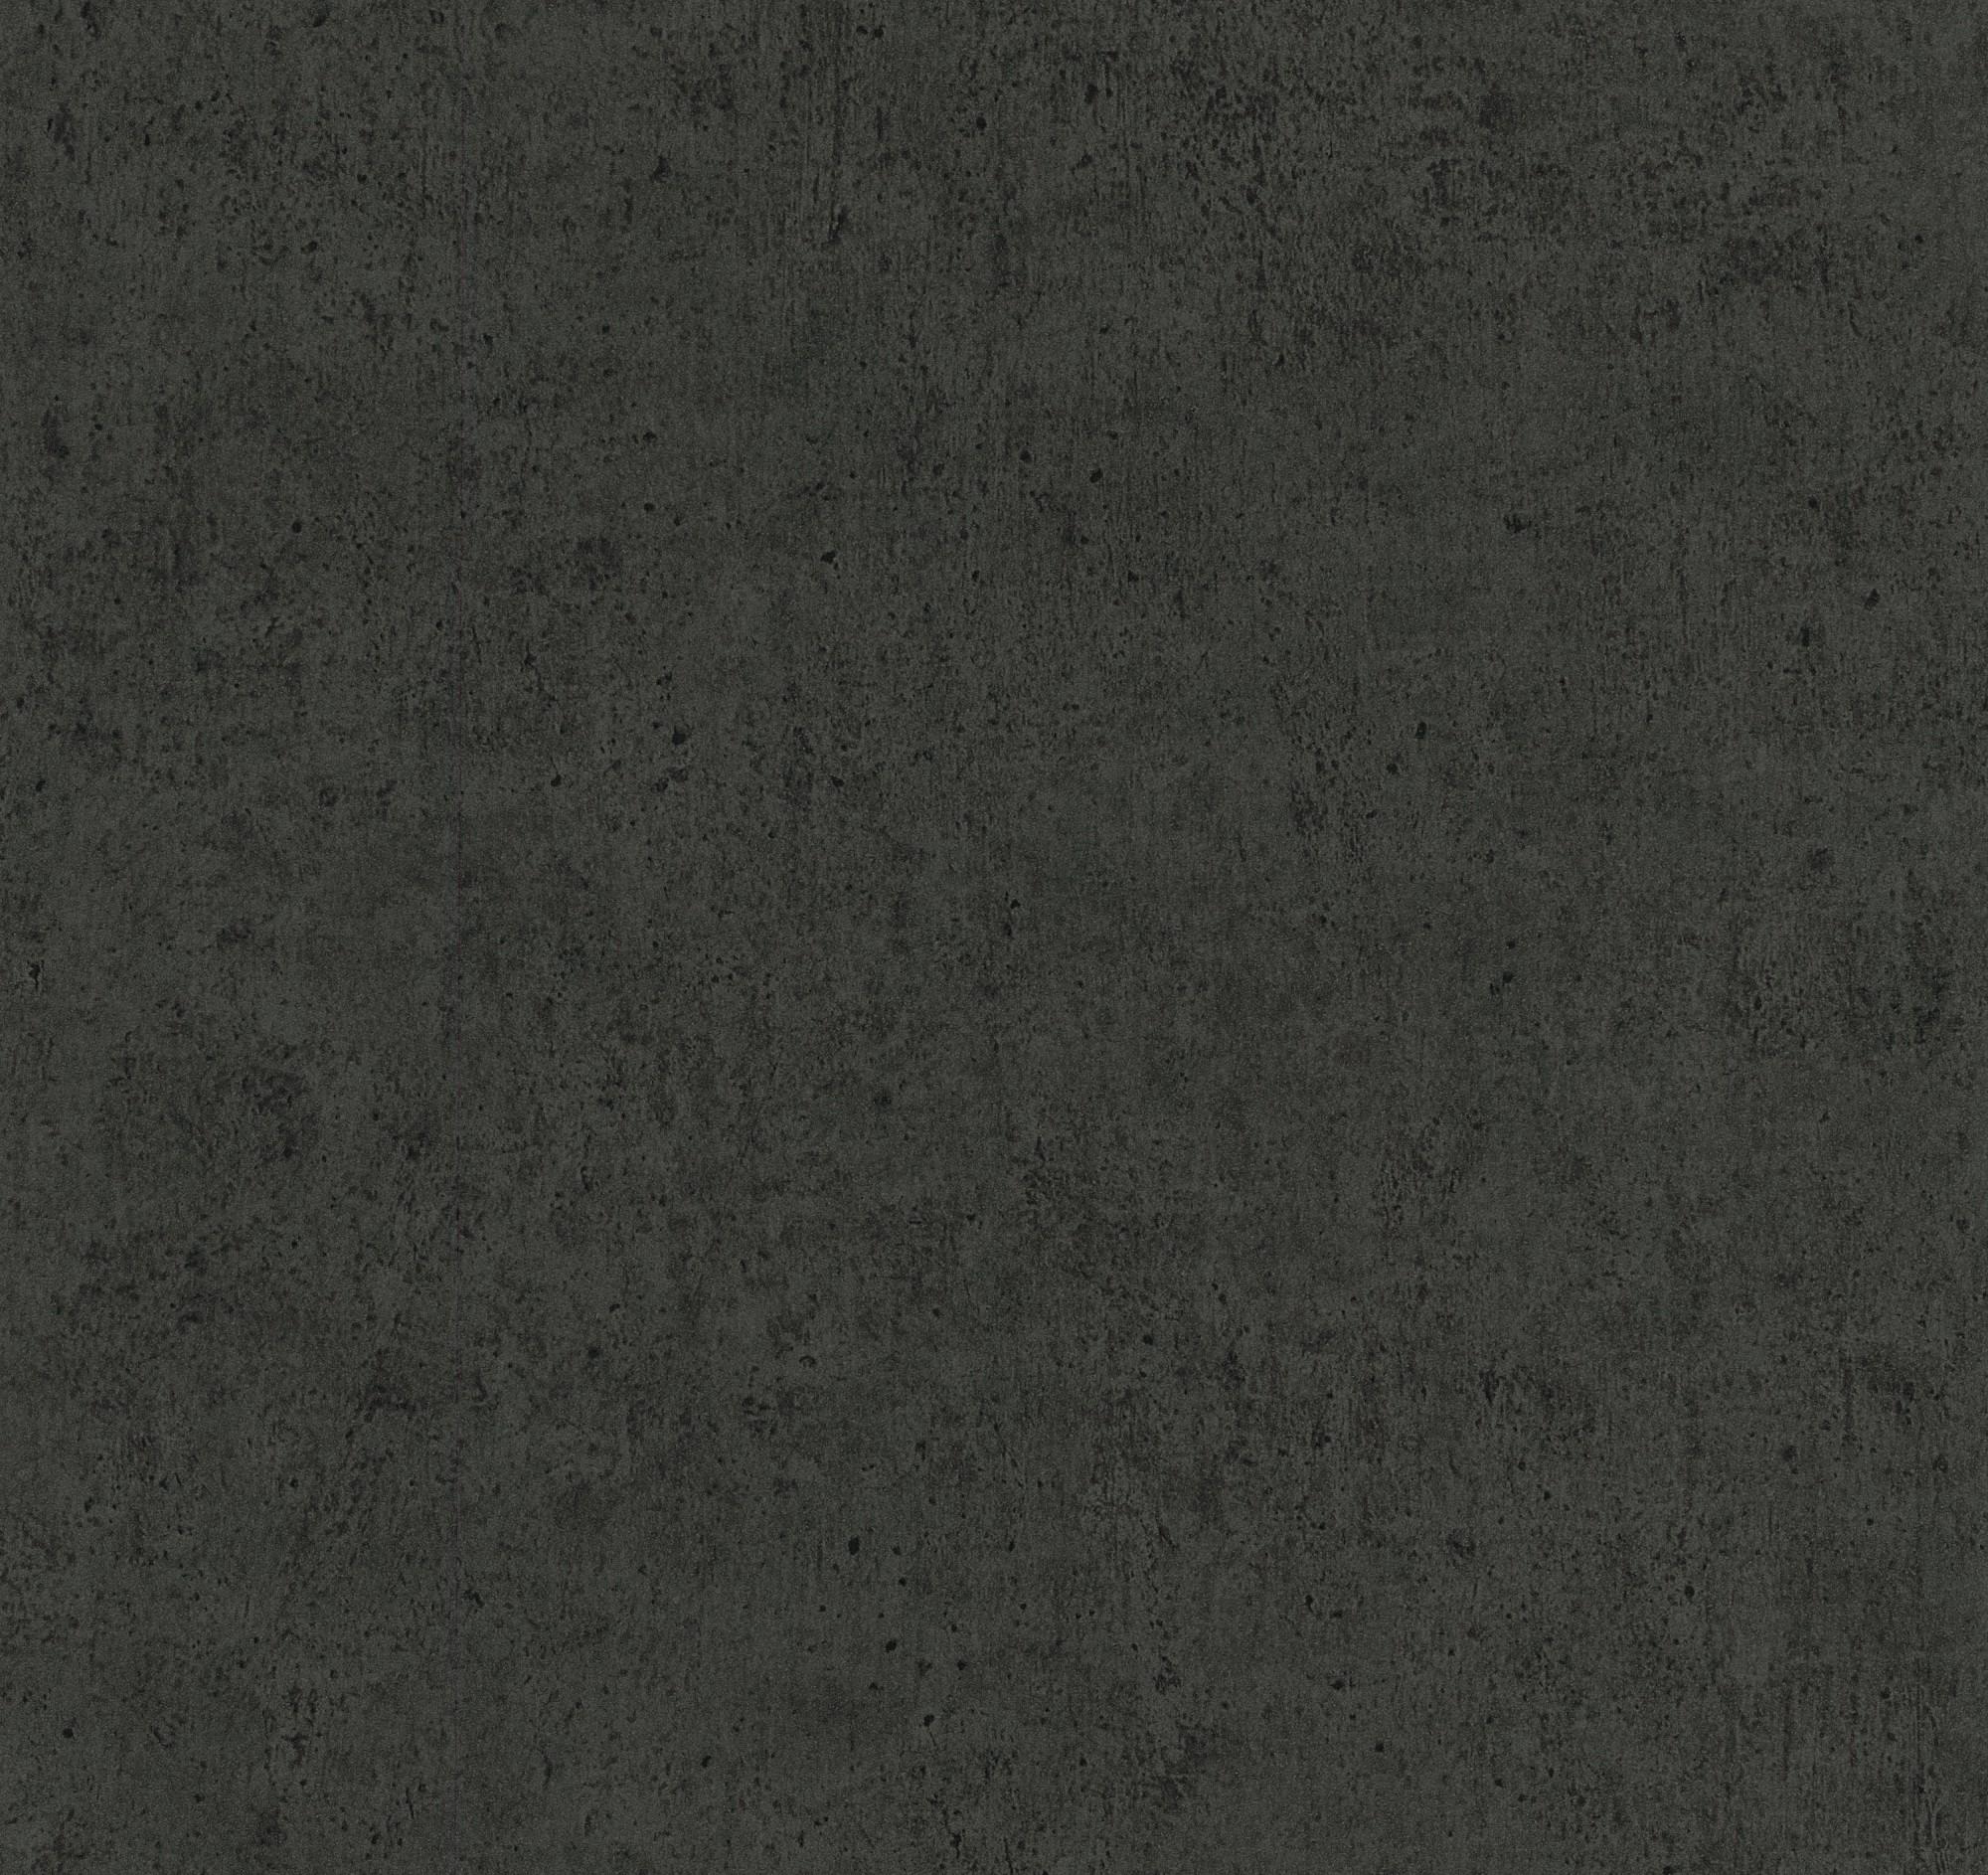 guido maria kretschmer tapete schwarz beton 02464 30. Black Bedroom Furniture Sets. Home Design Ideas